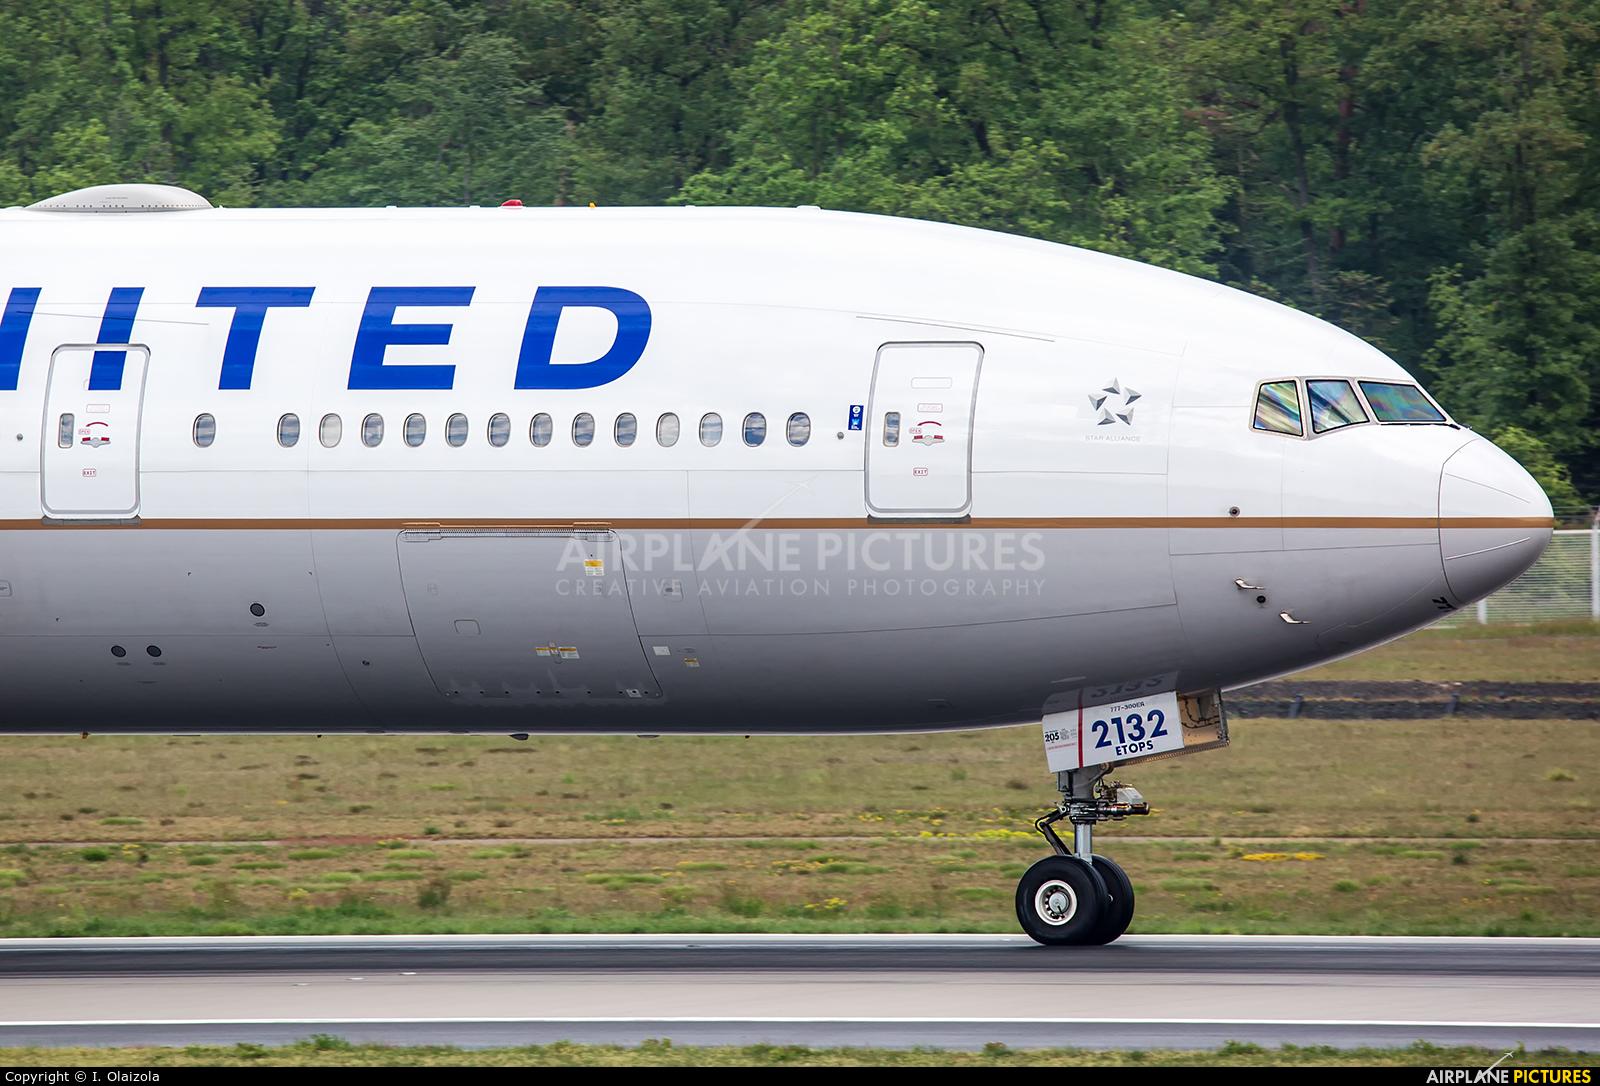 United Airlines N2332U aircraft at Frankfurt